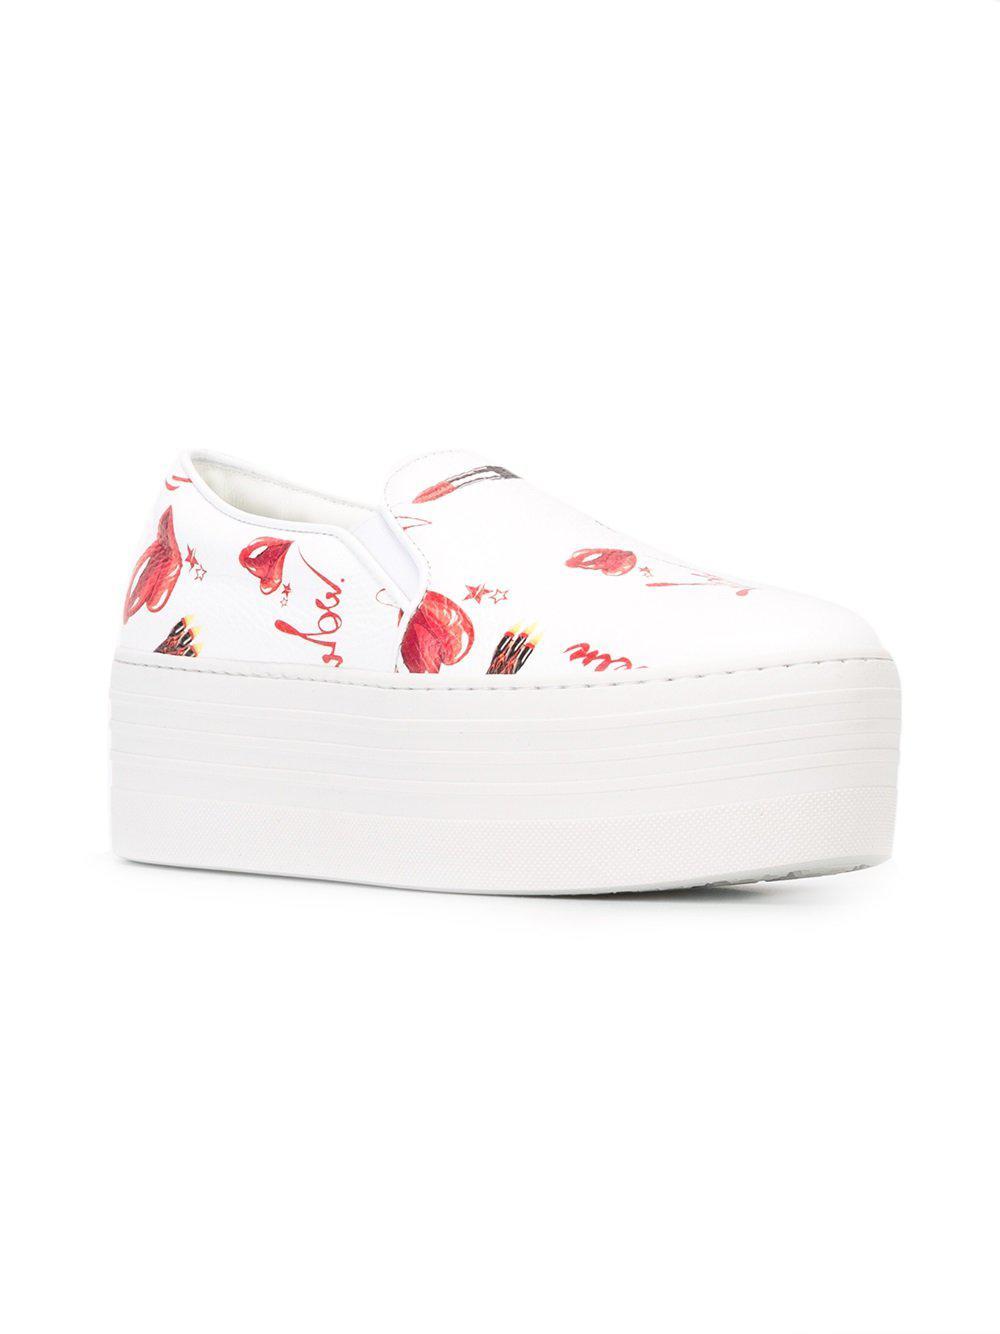 Philipp Plein Leather Printed Flatform Sneakers in White